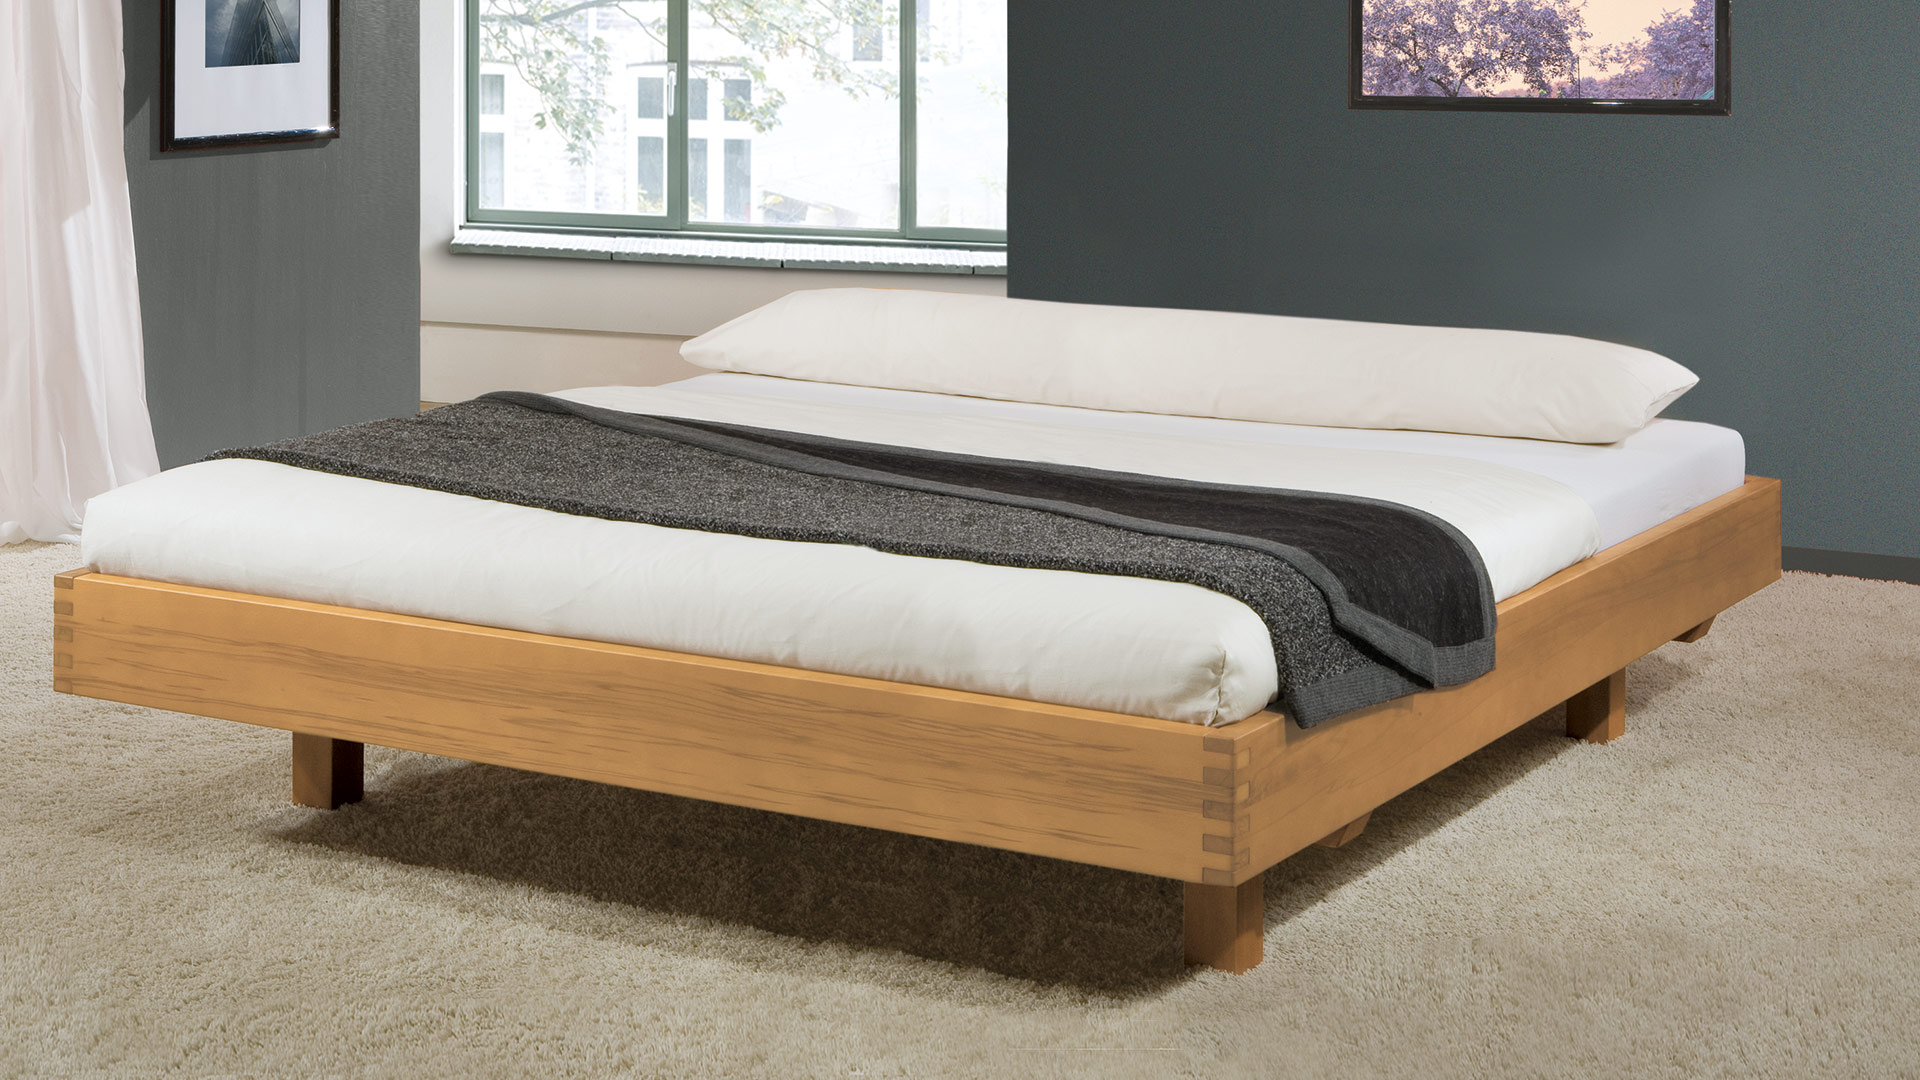 Allnatura Betten einzelbett und doppelbett verona liege allnatura de